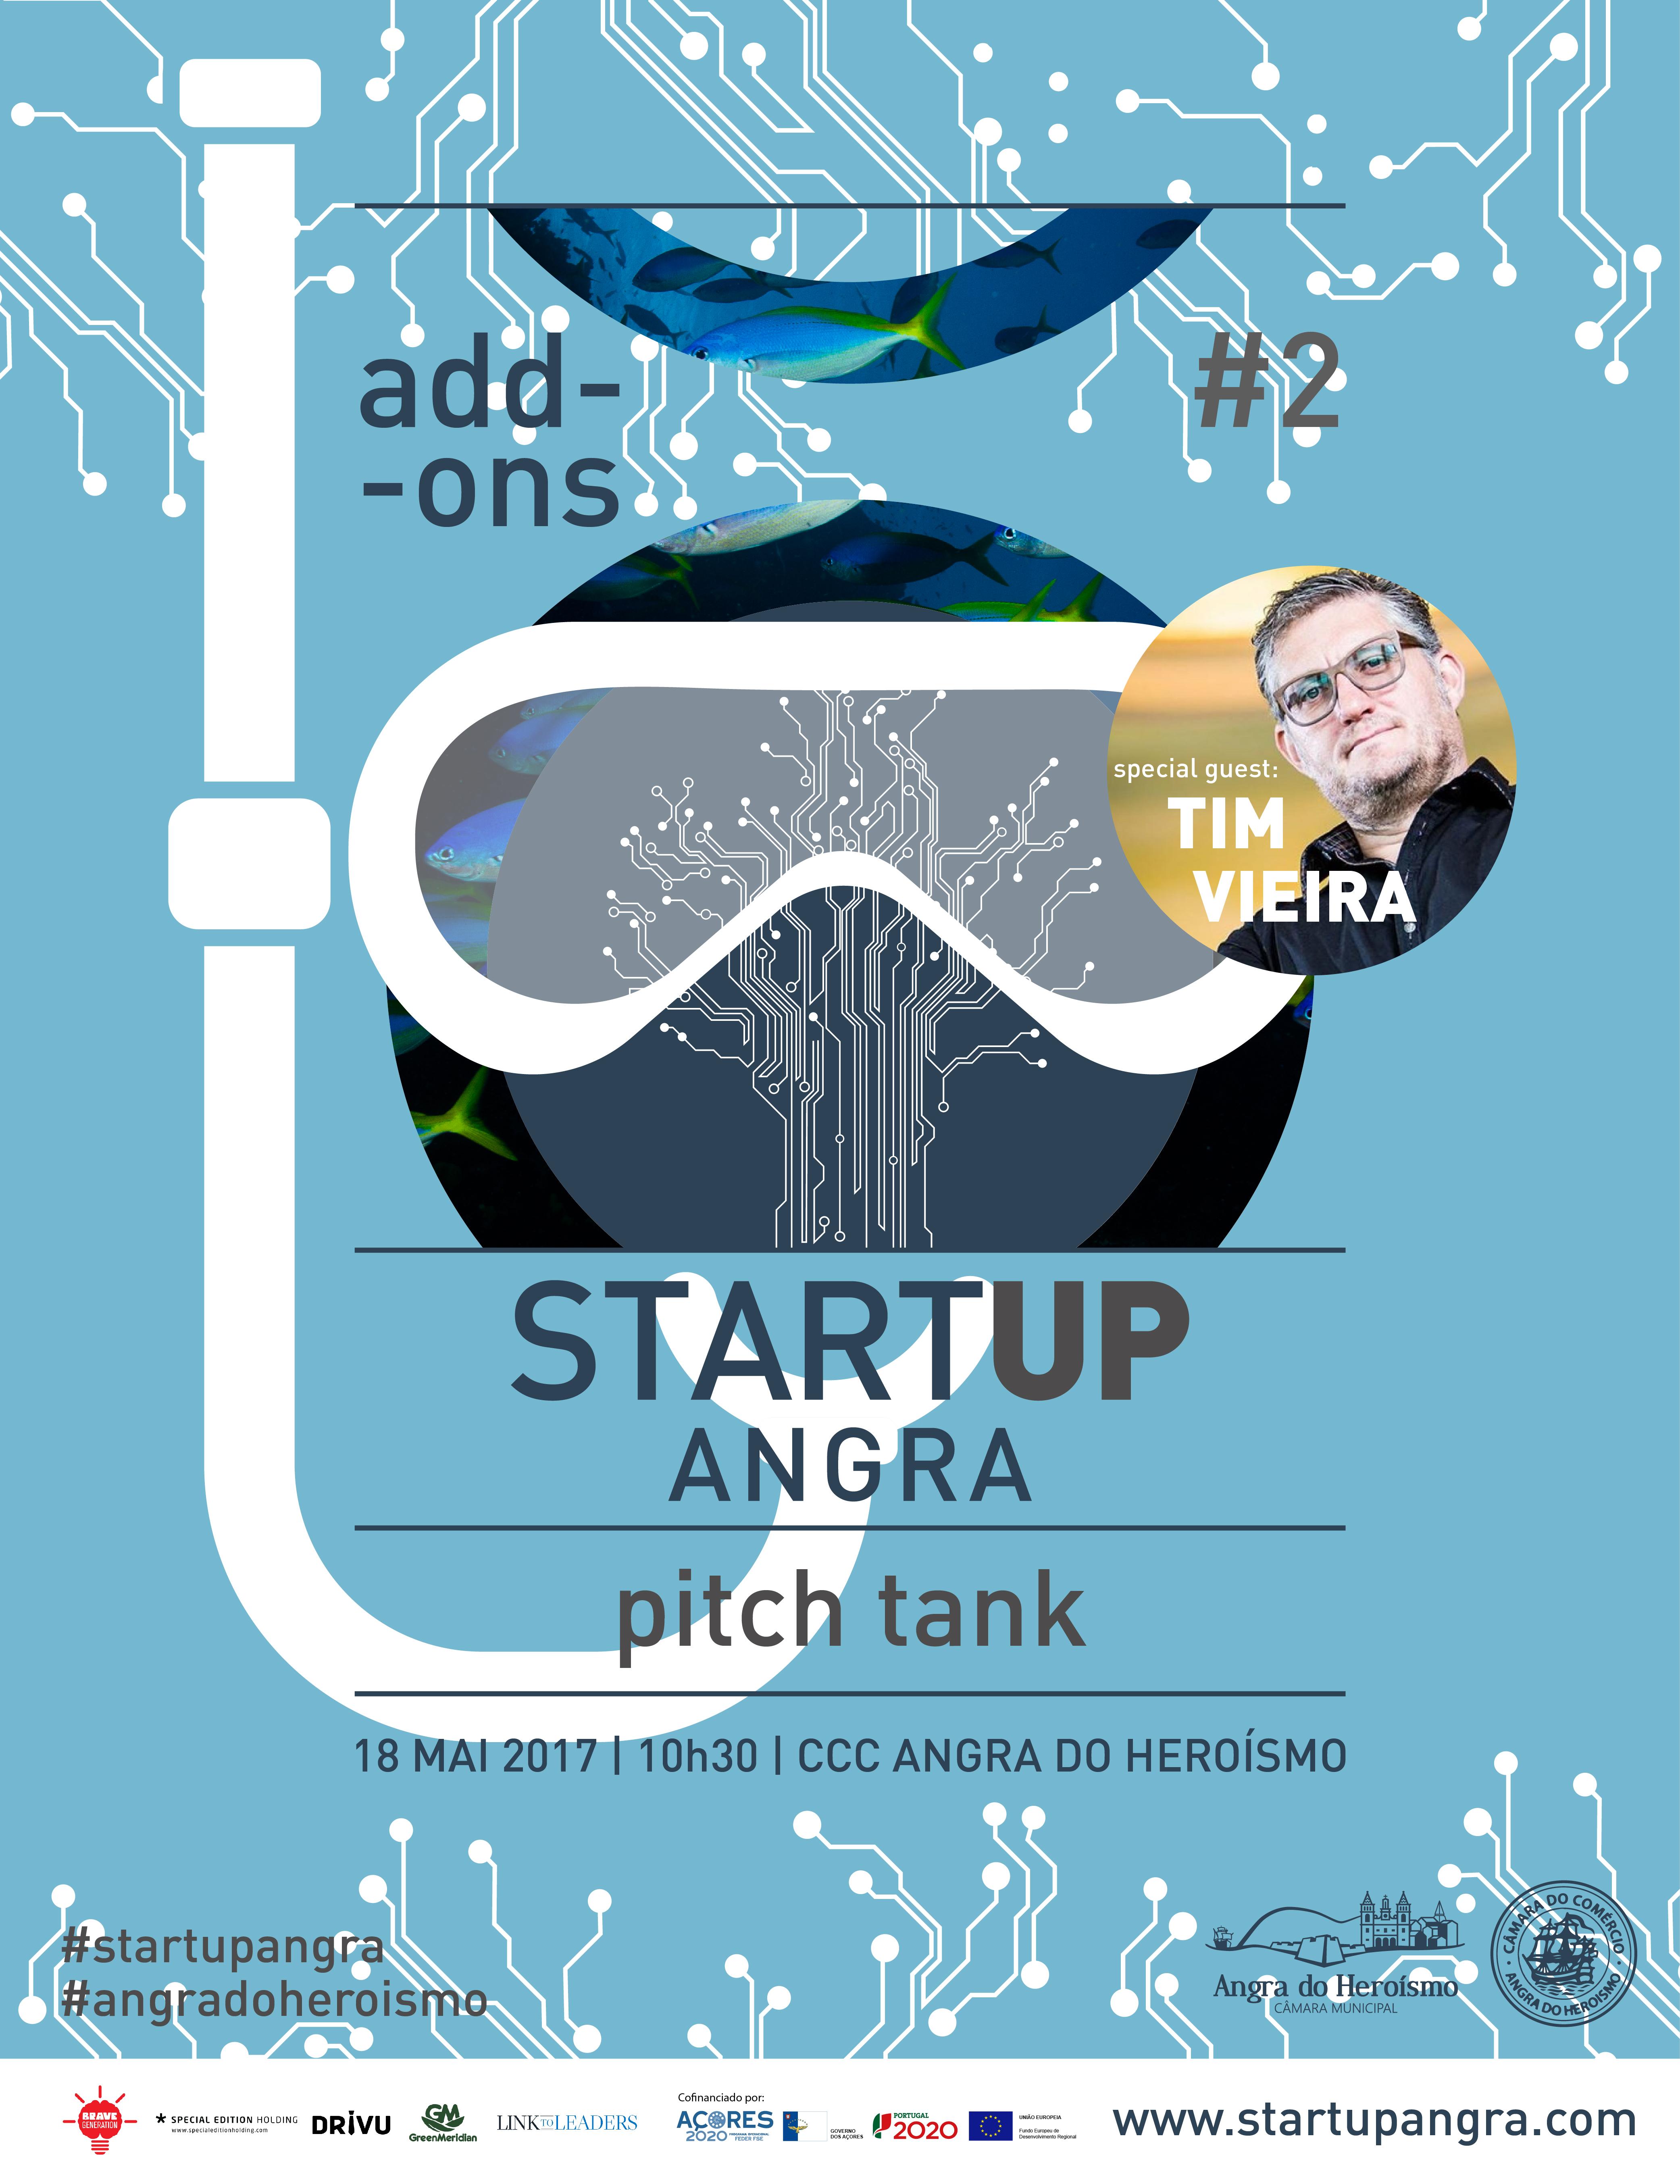 http://www.startupangra.com/wp-content/uploads/2017/04/poster-add-on-2.jpg